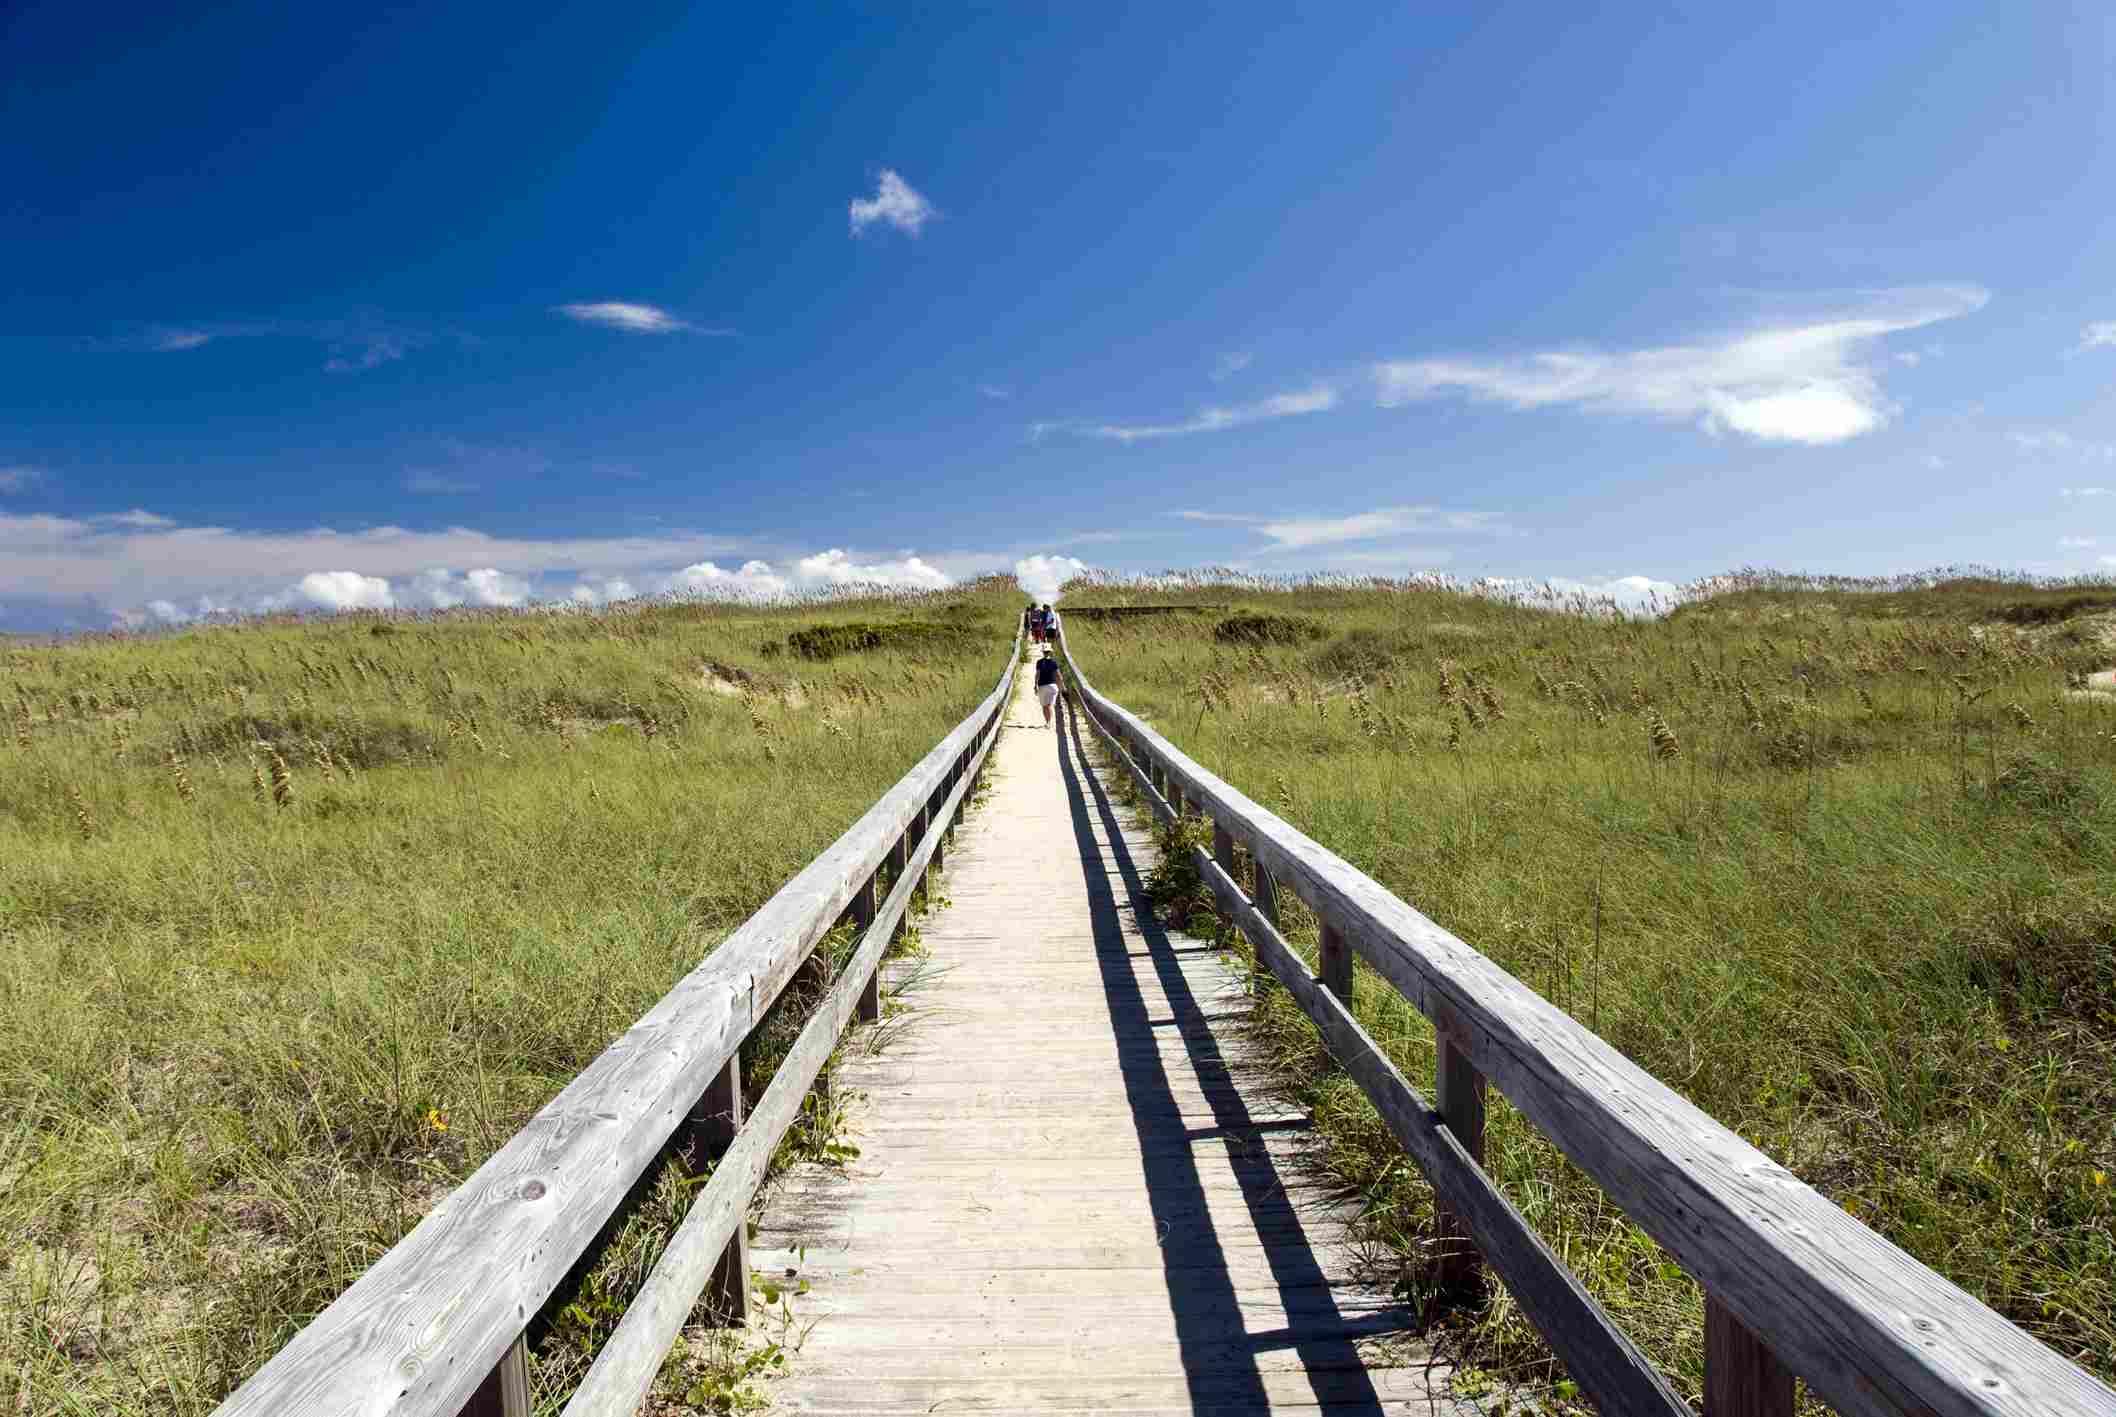 Wooden boardwalk to beach, Hatteras, Outer Banks